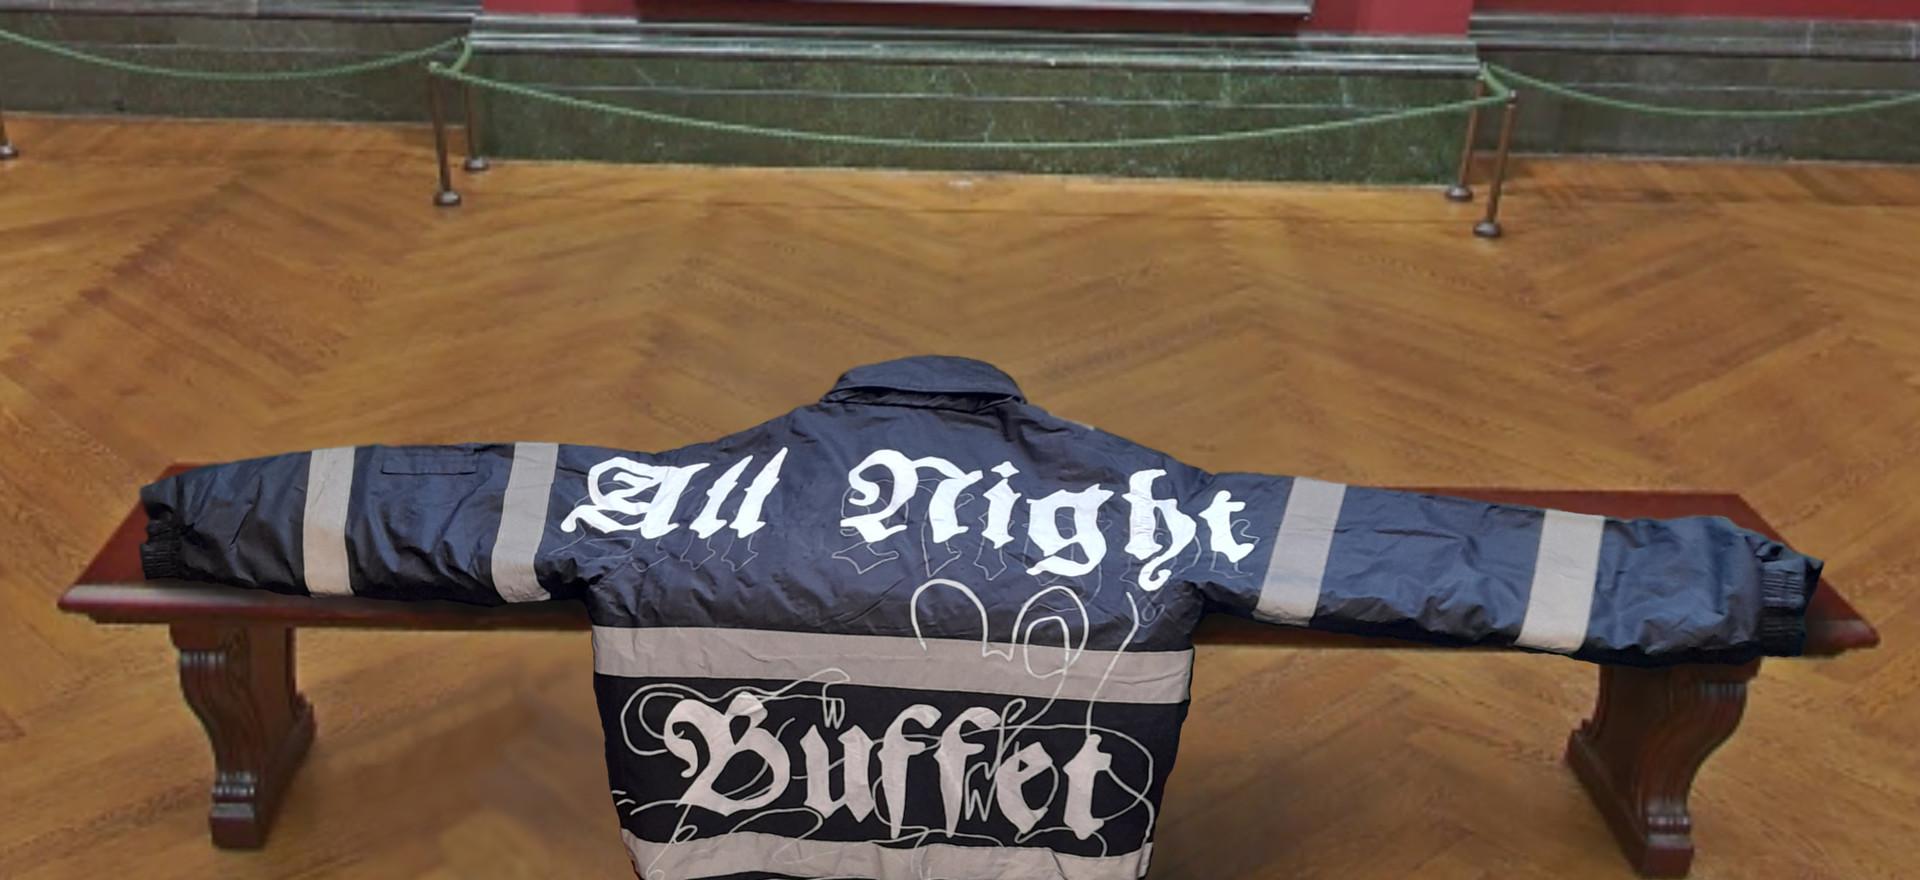 all night buffet